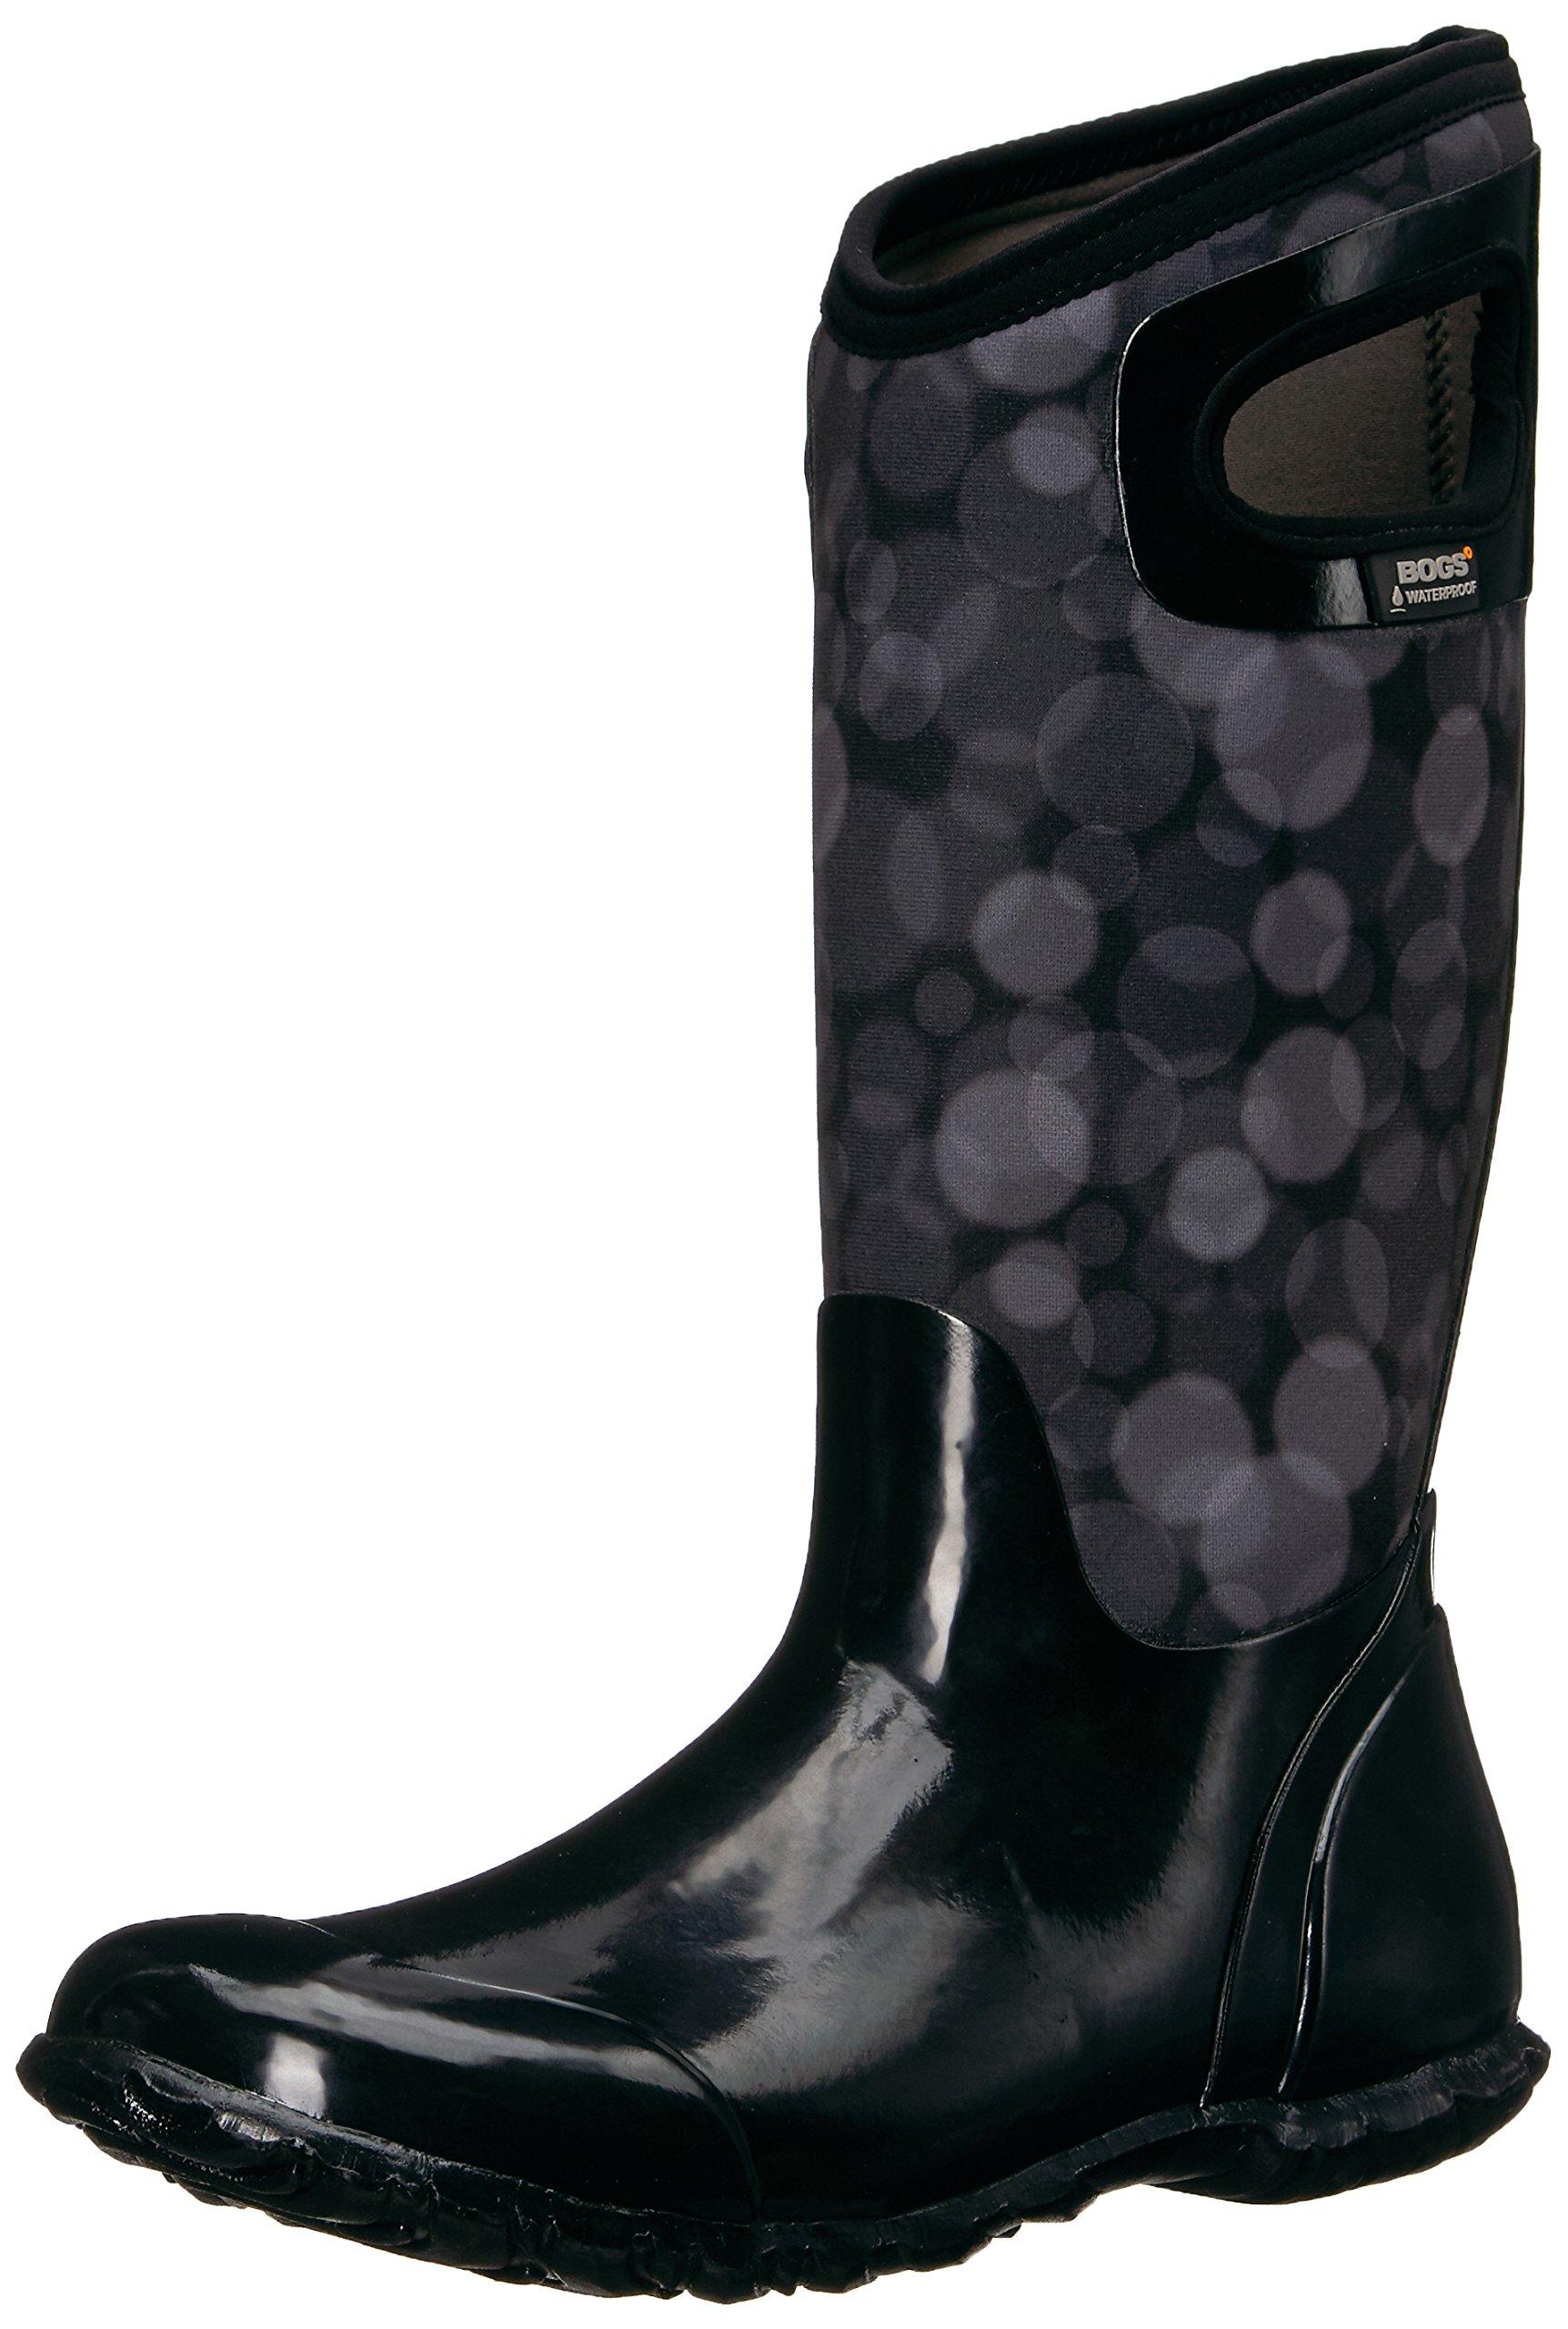 Bogs Women's North Hampton Rain Snow Boot, Black/Multi, 8 M US